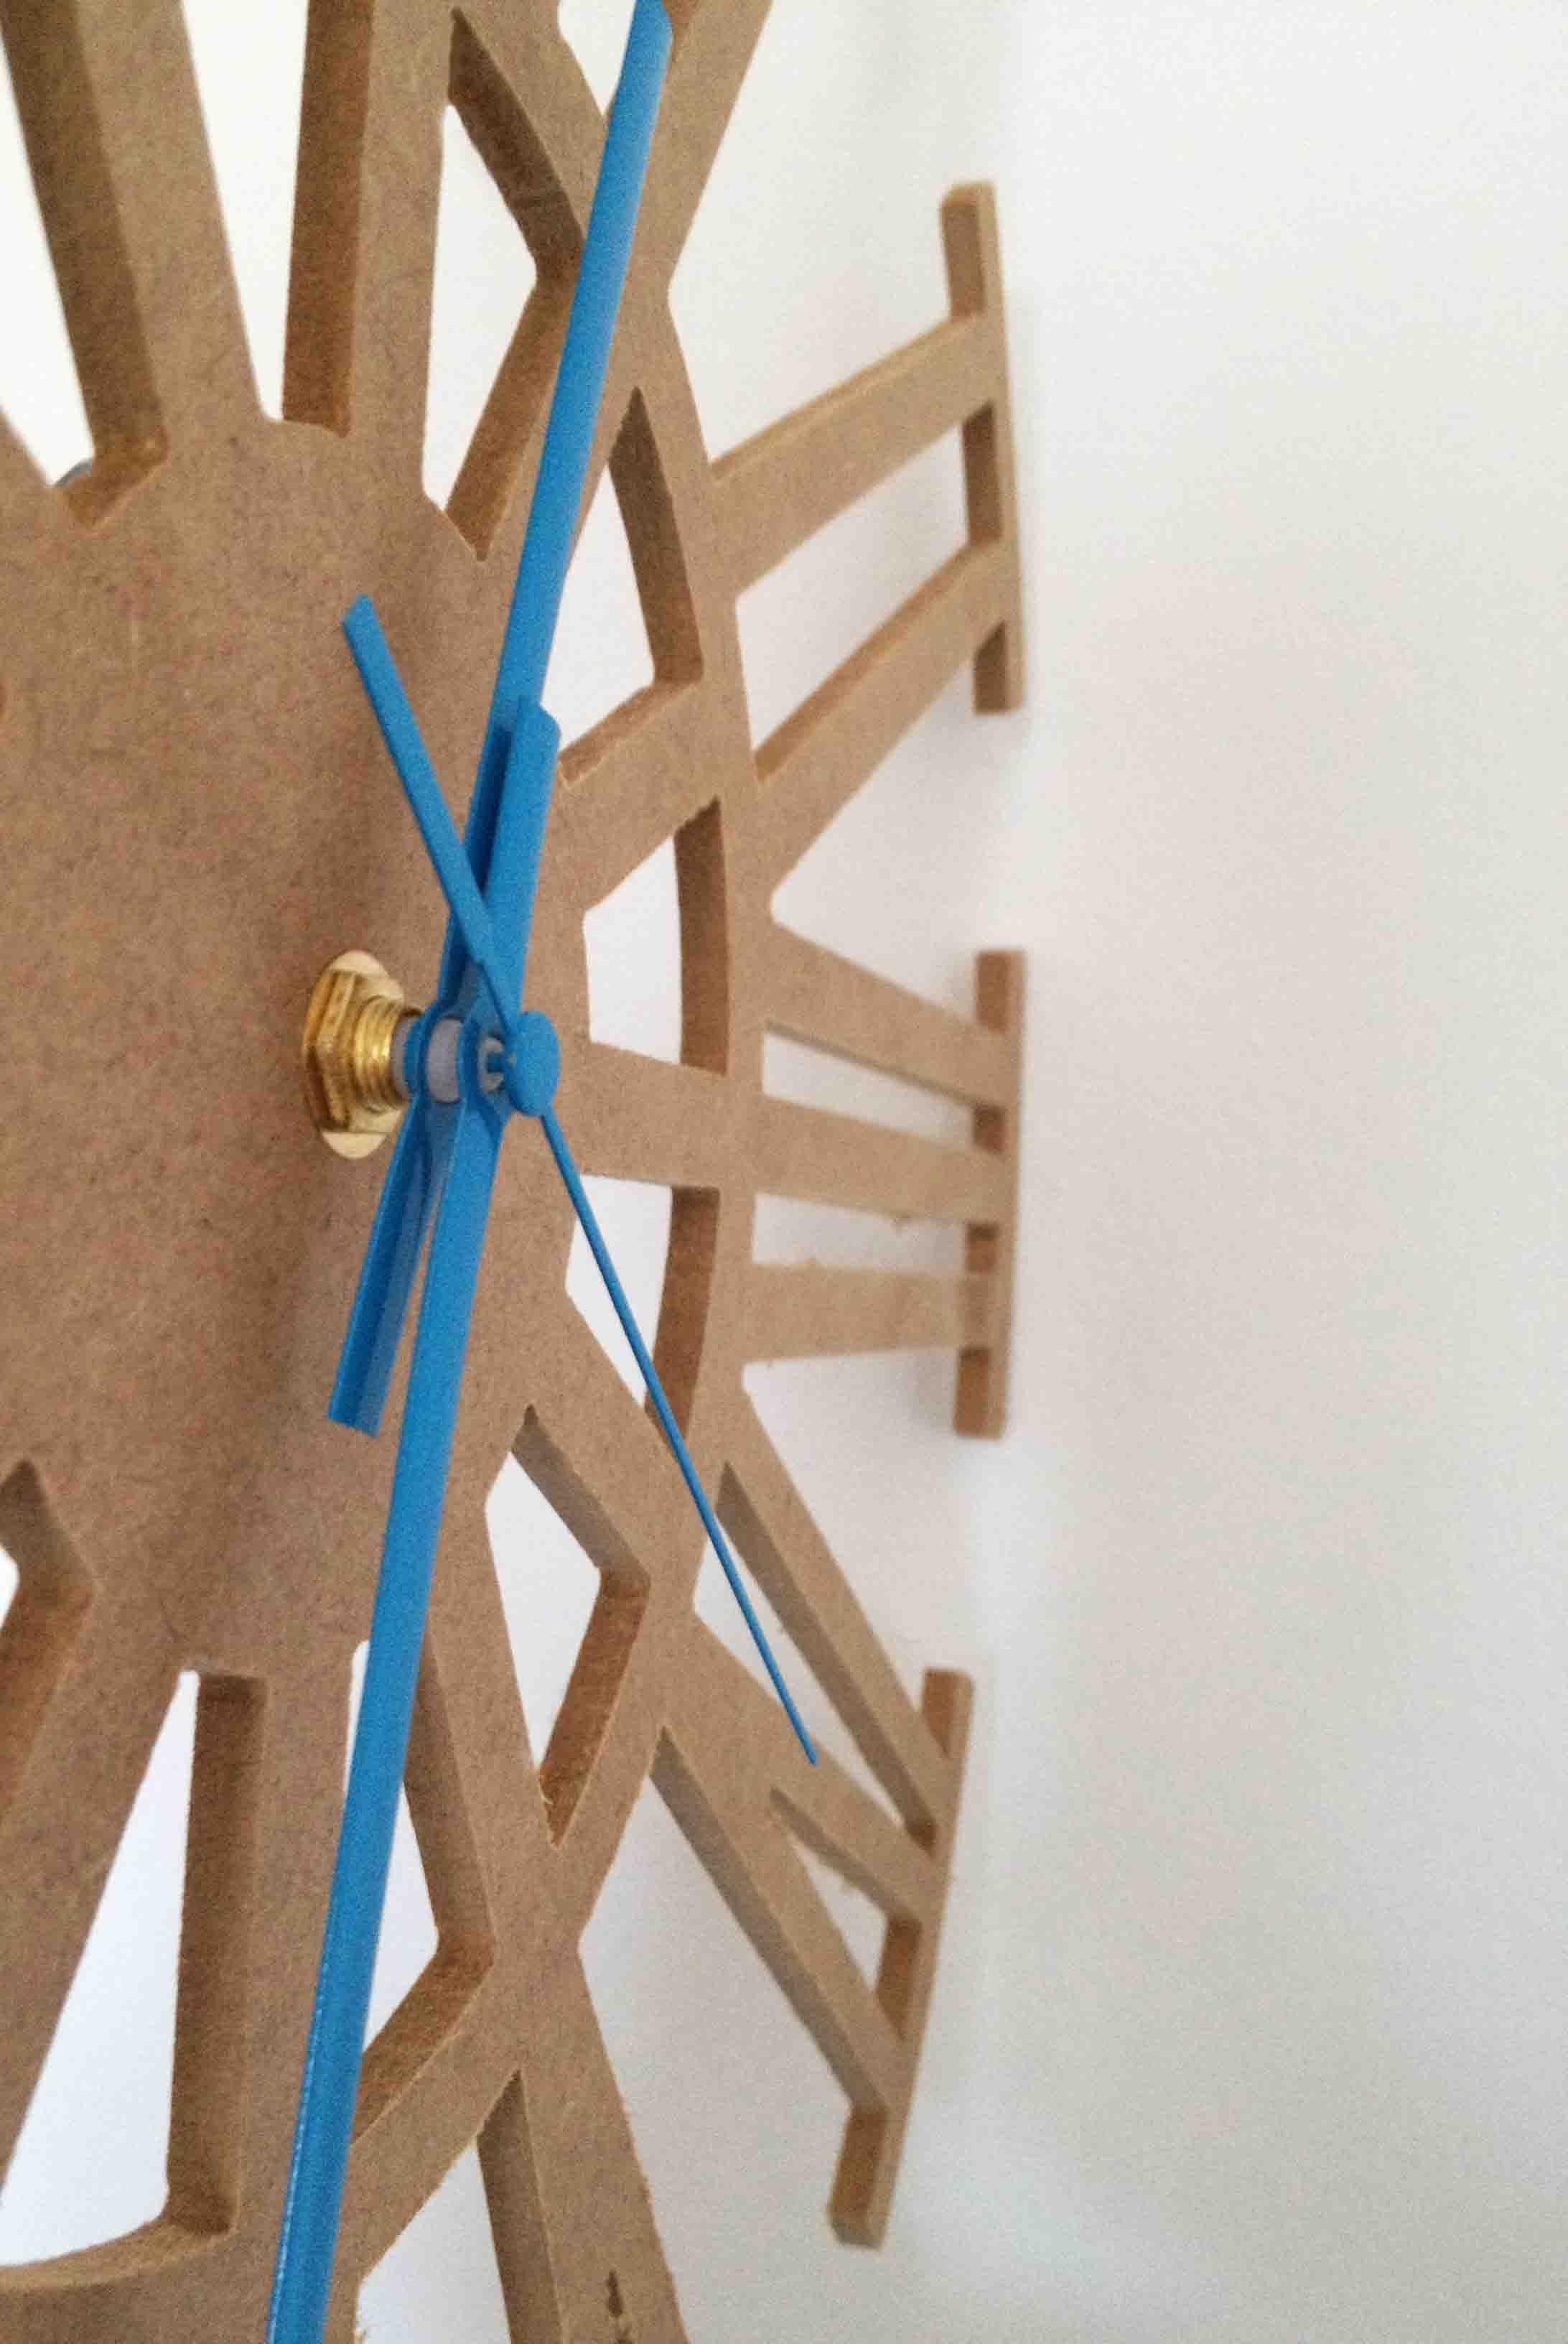 Cnc Tresencaja Wood Madera Dise O Muebles Diseno Design  # Muebles Raros De Madera